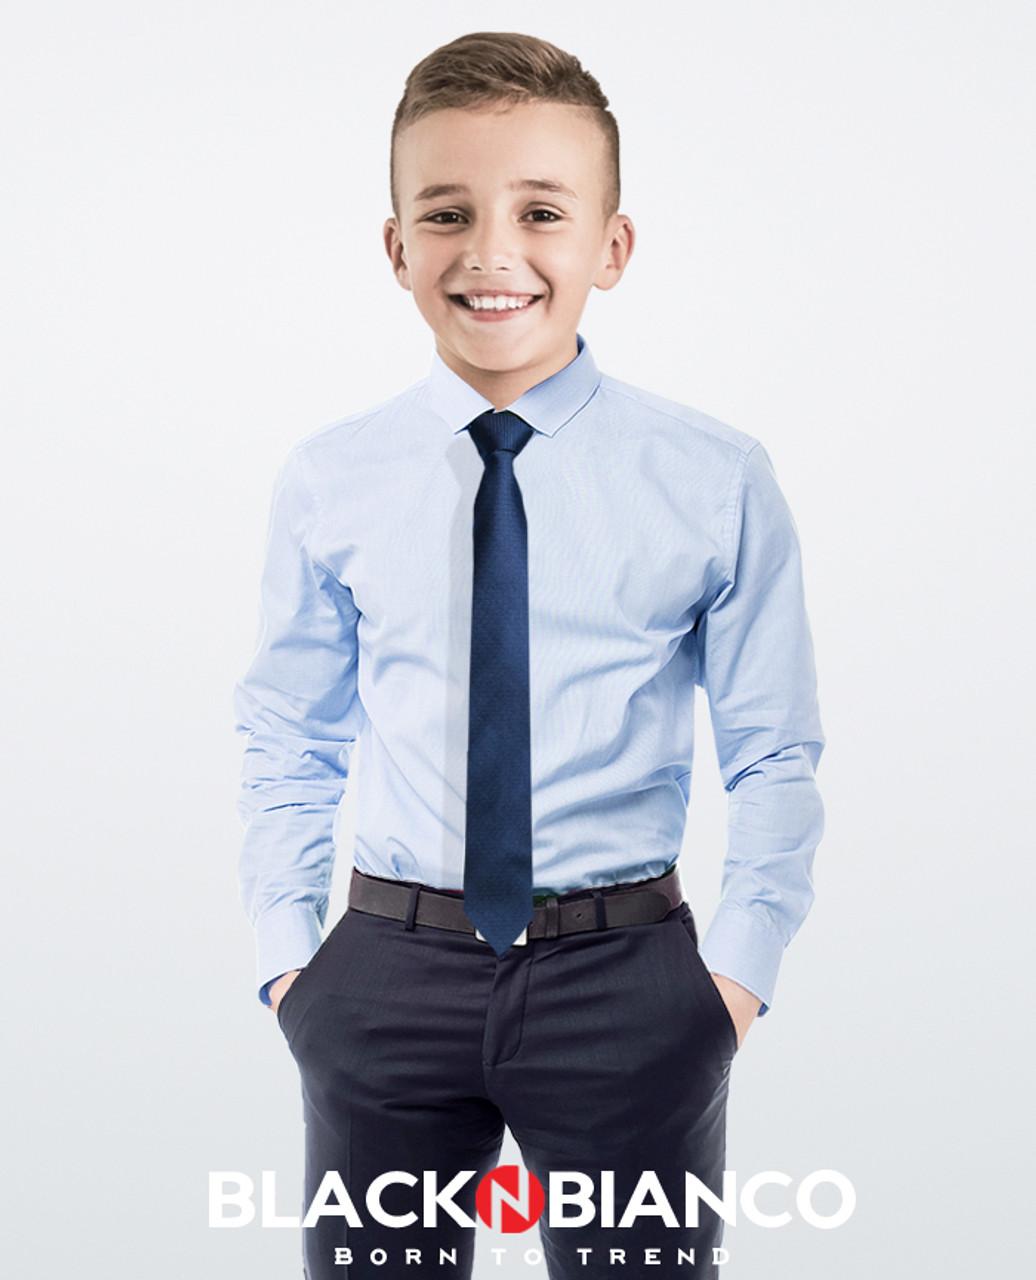 Black n Bianco Boys Elite Button Down Dress Shirt in Light Blue with Navy Neck Tie